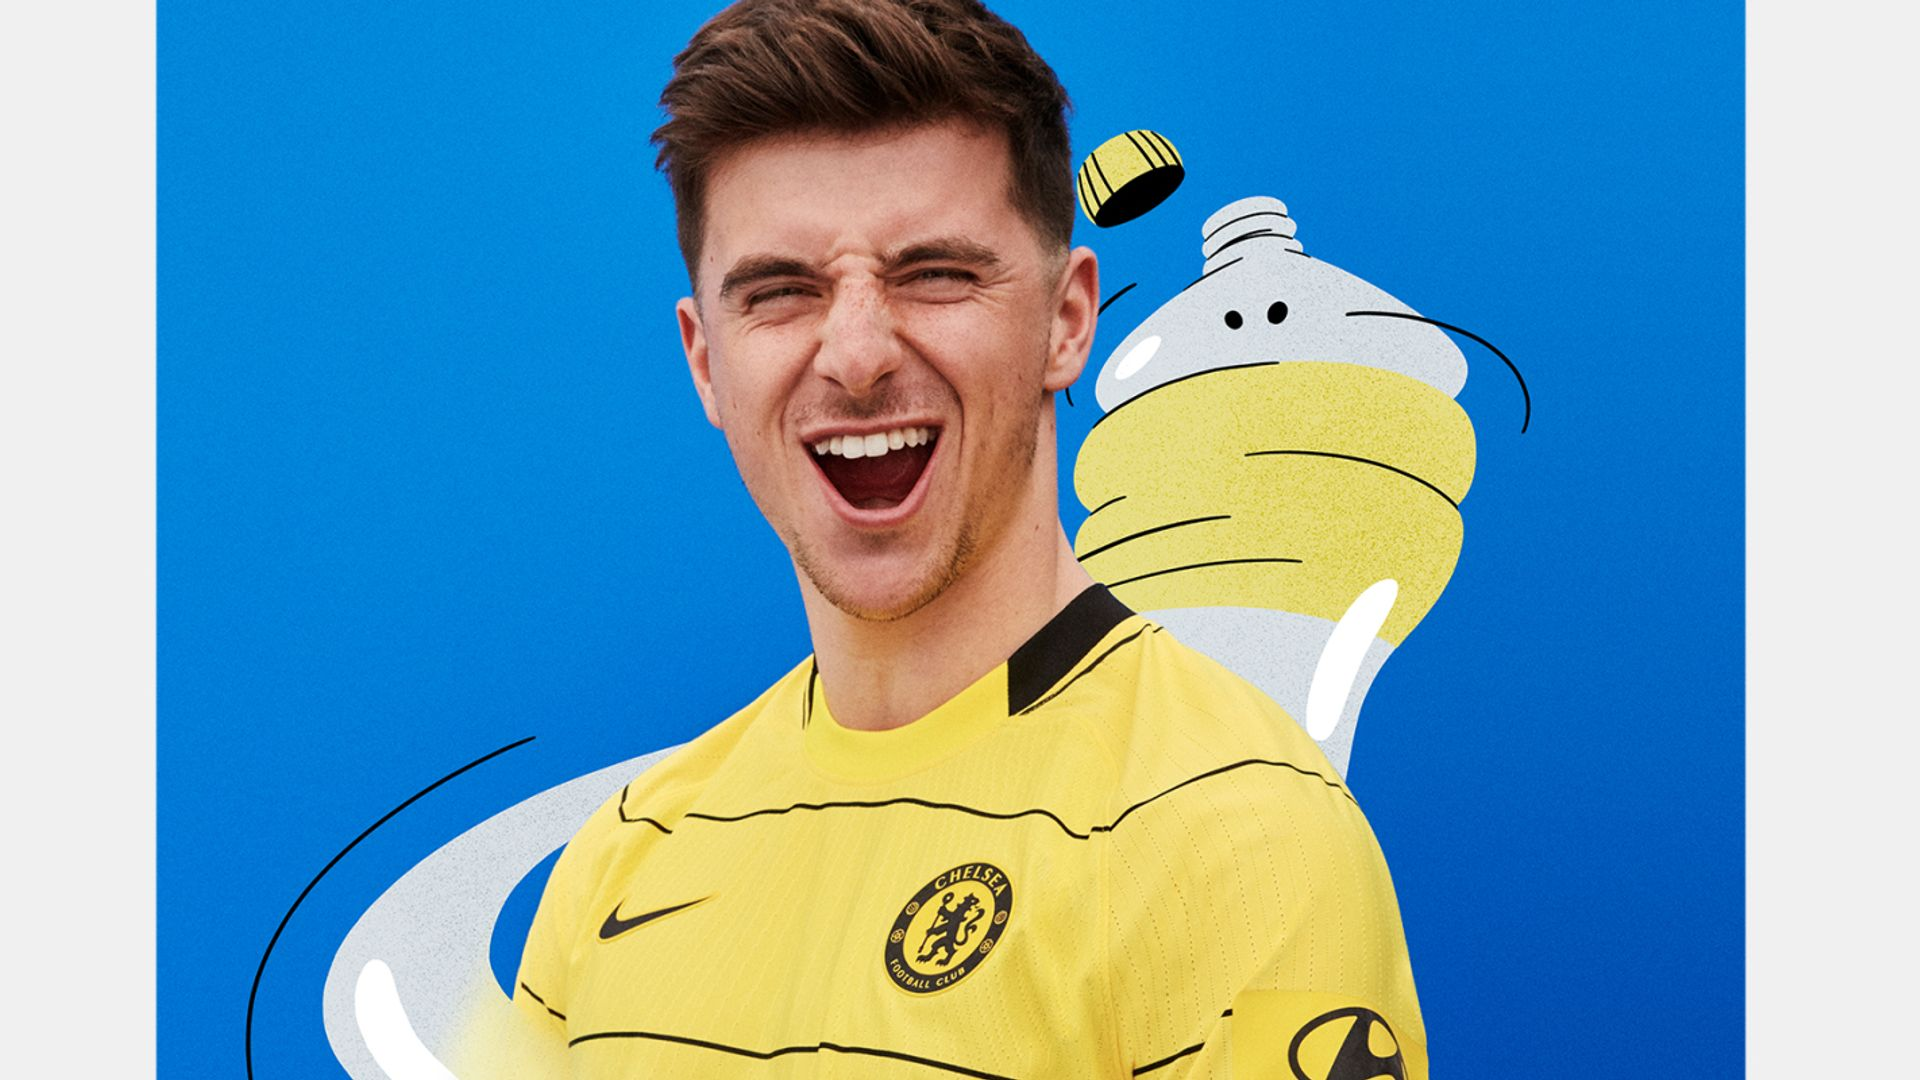 Premier League kits for 2021/22: Chelsea return to yellow away kit